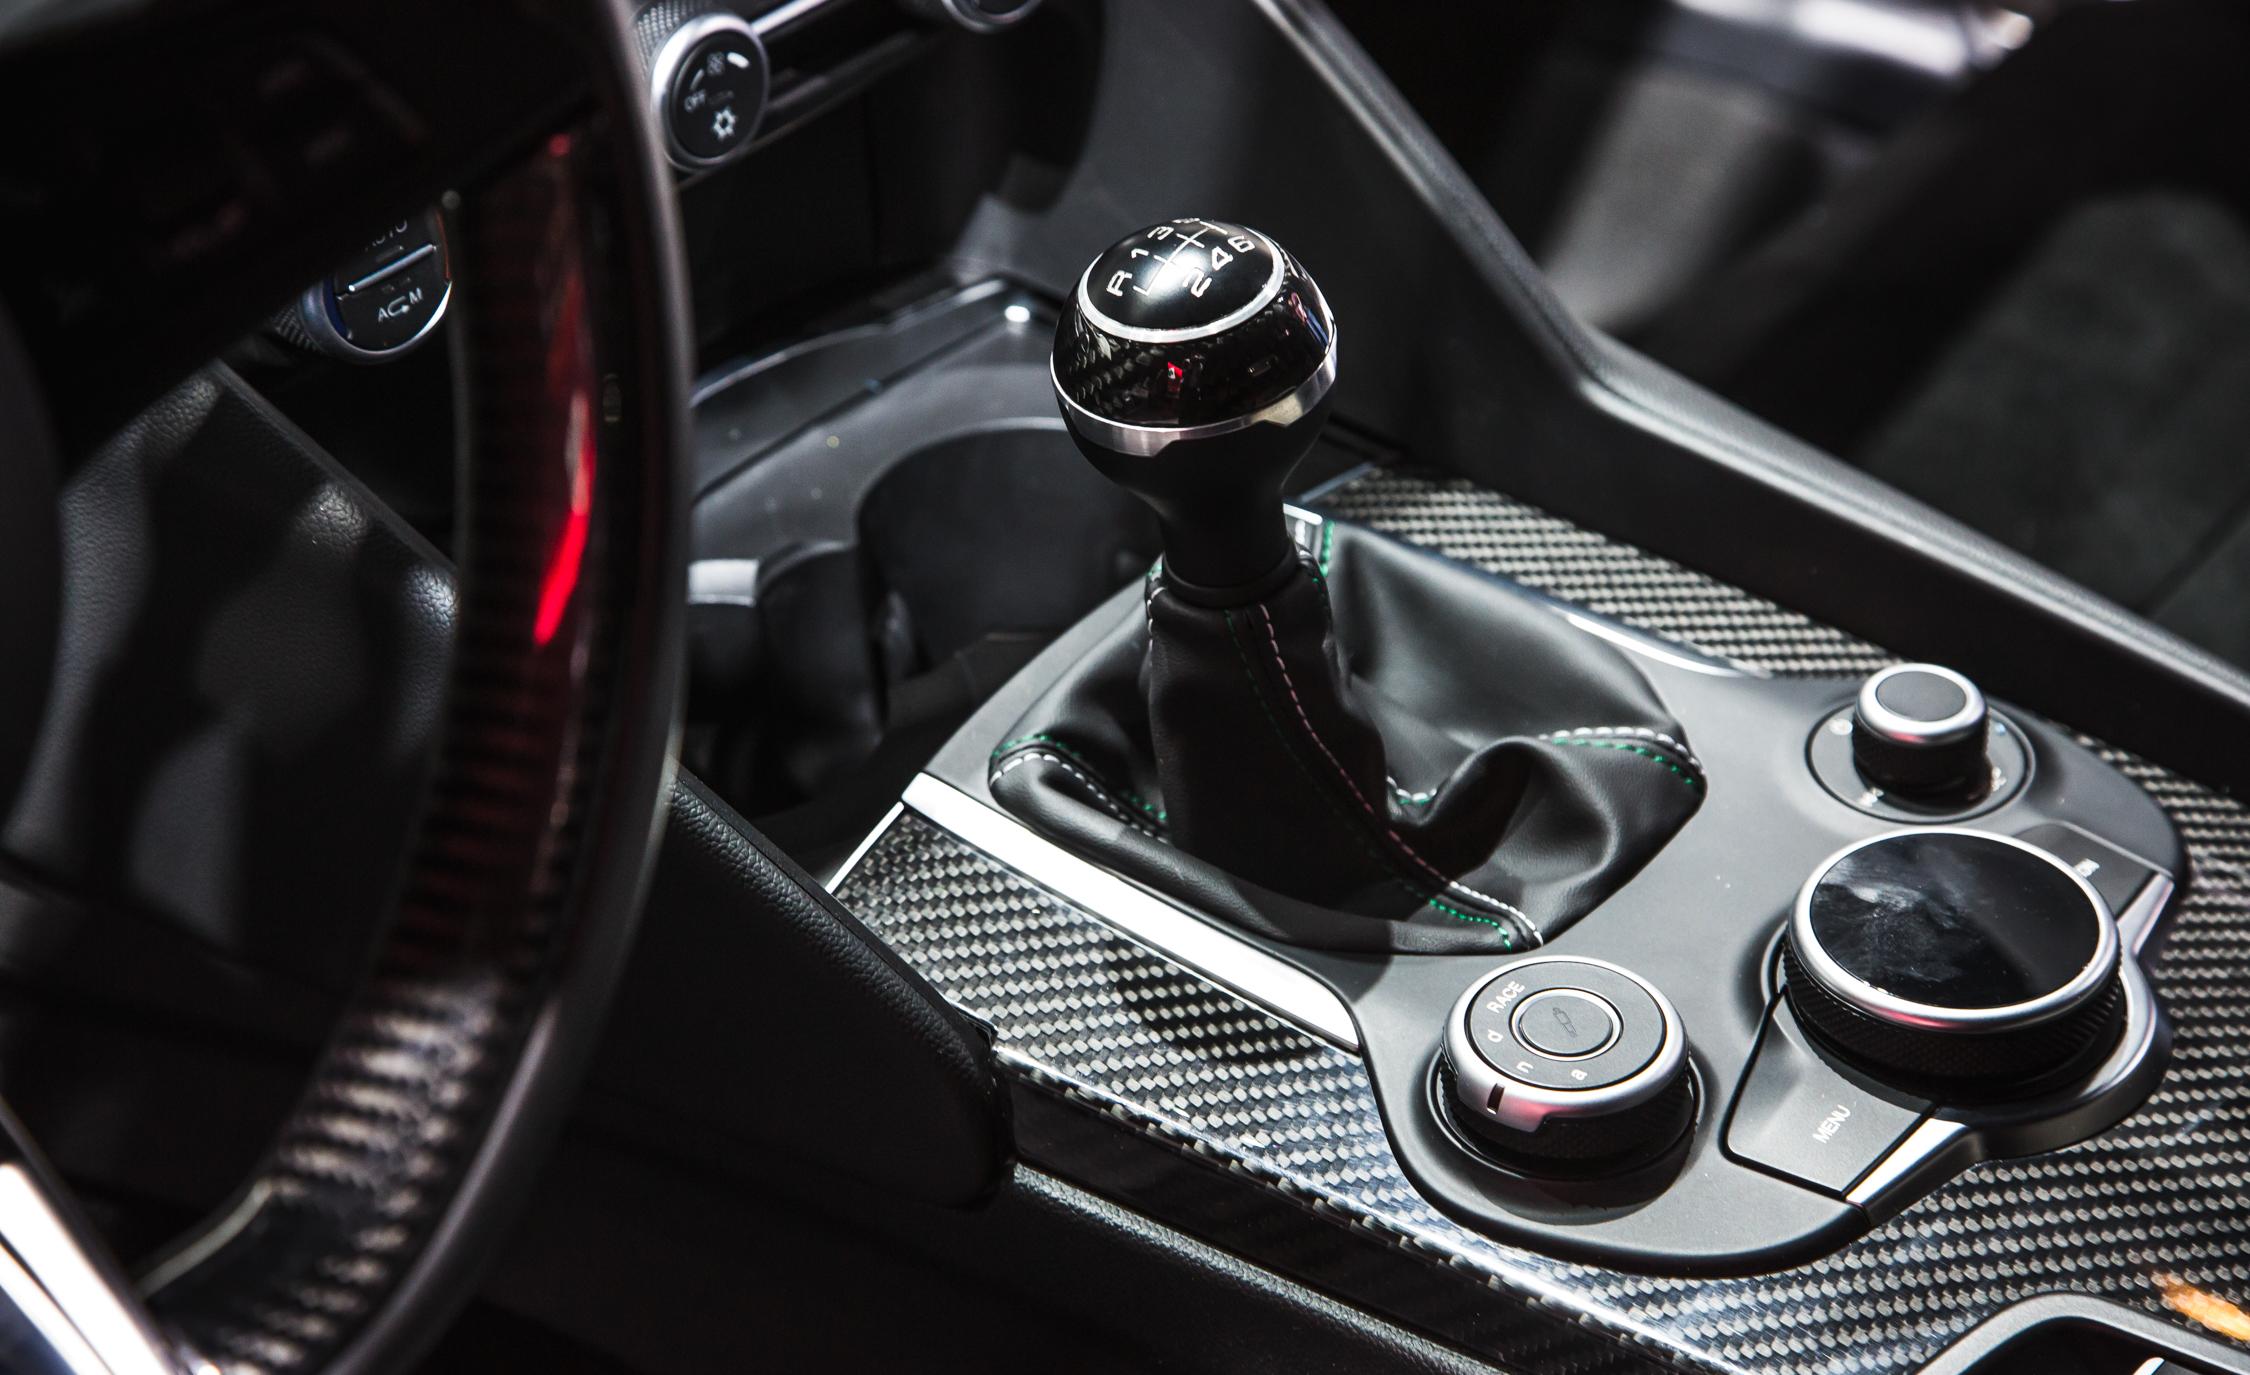 2017 Alfa Romeo Giulia Quadrifoglio Gear Shift Knob